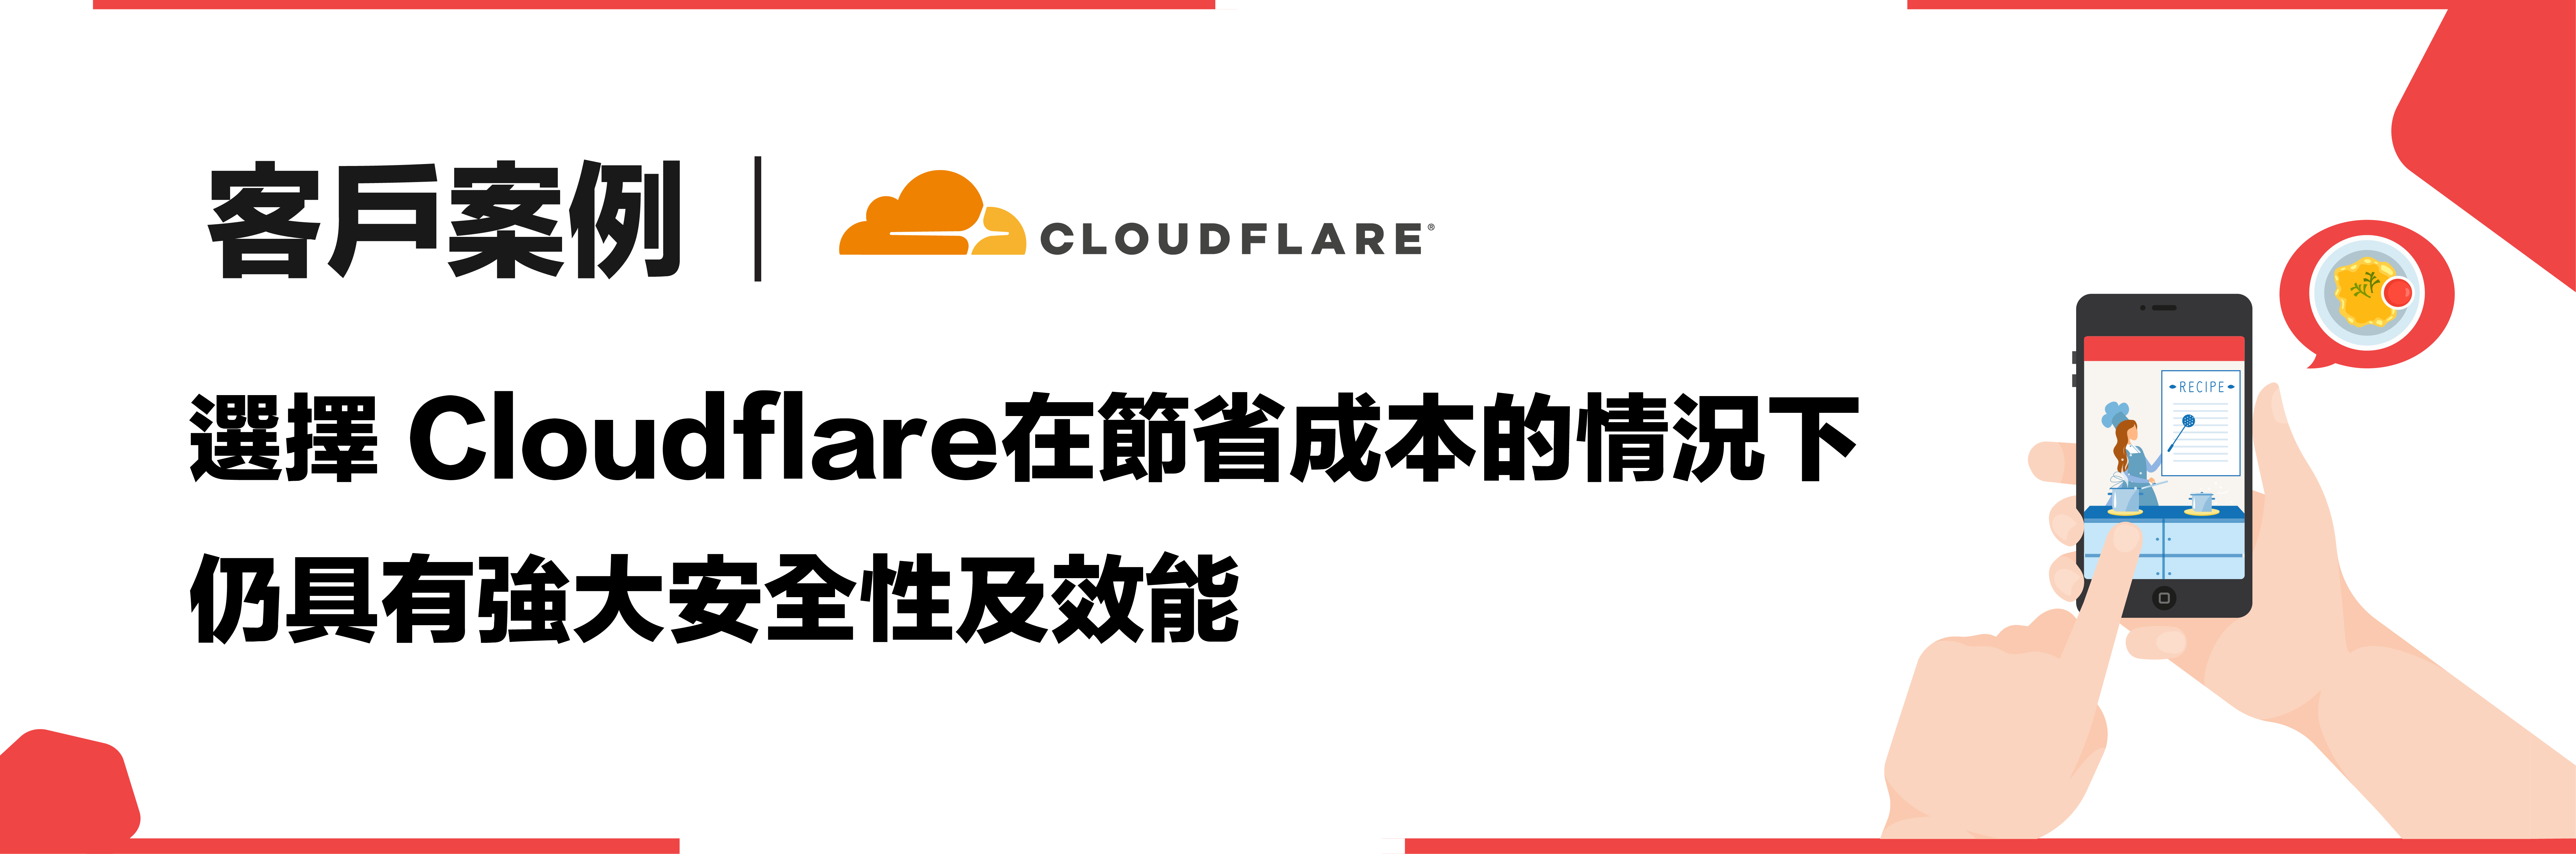 cloudflare_showcase_icook